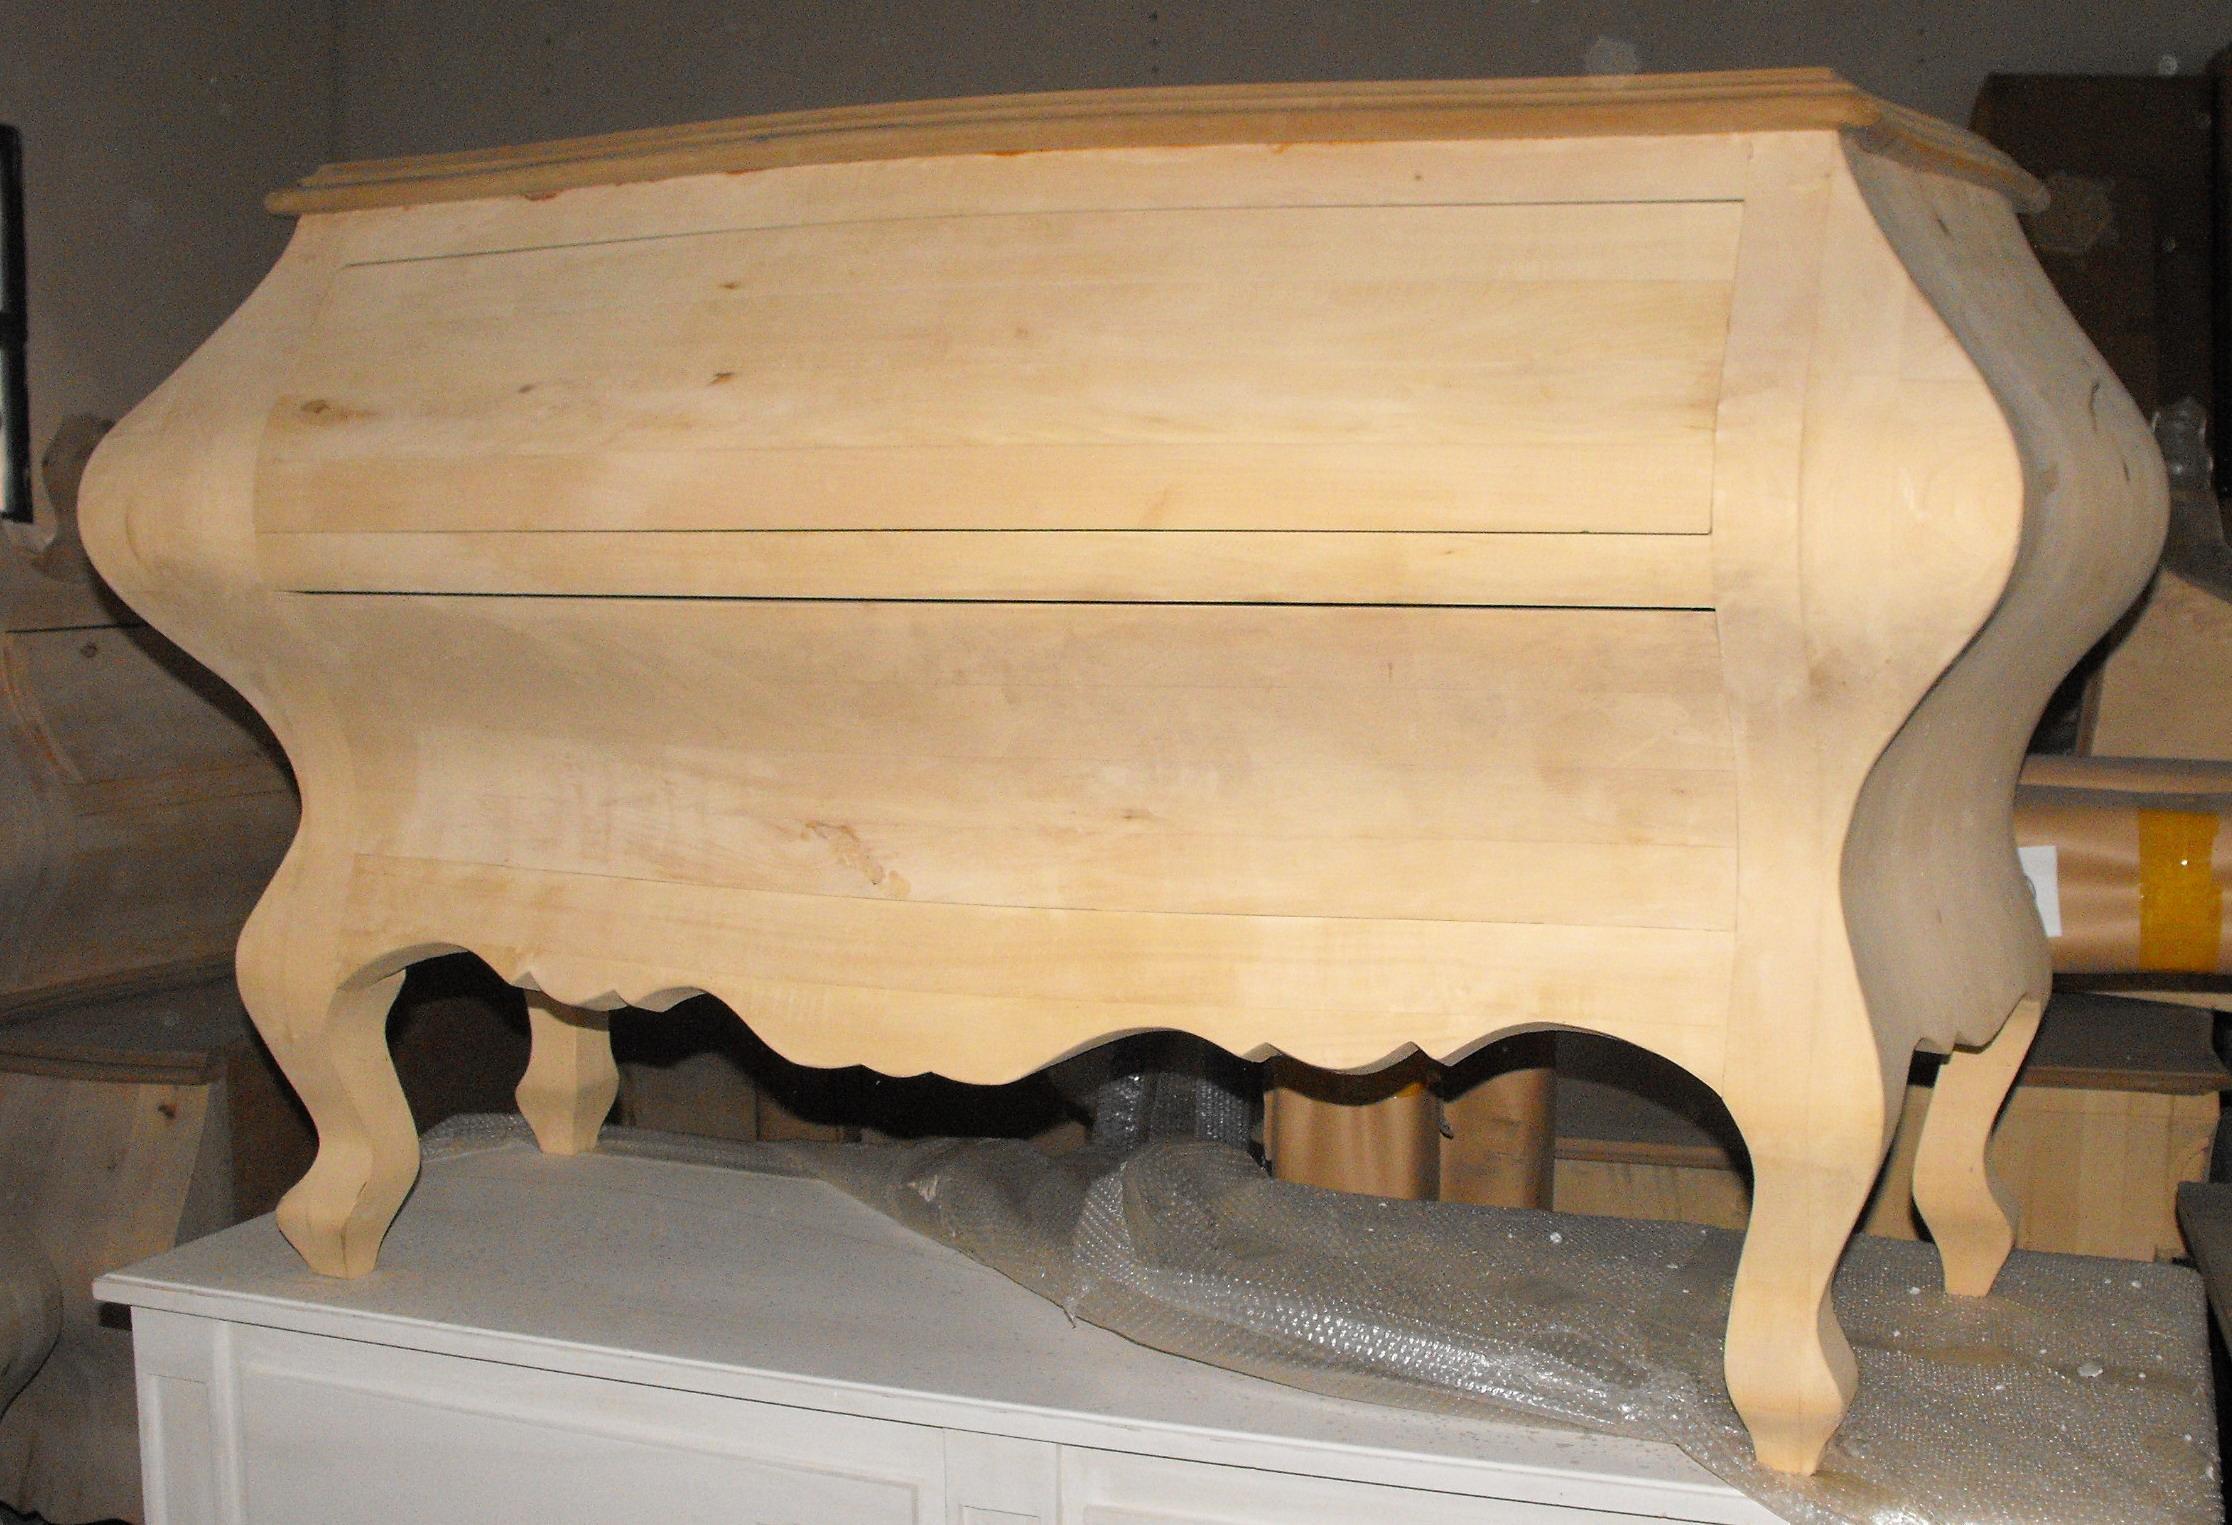 Convex dresser